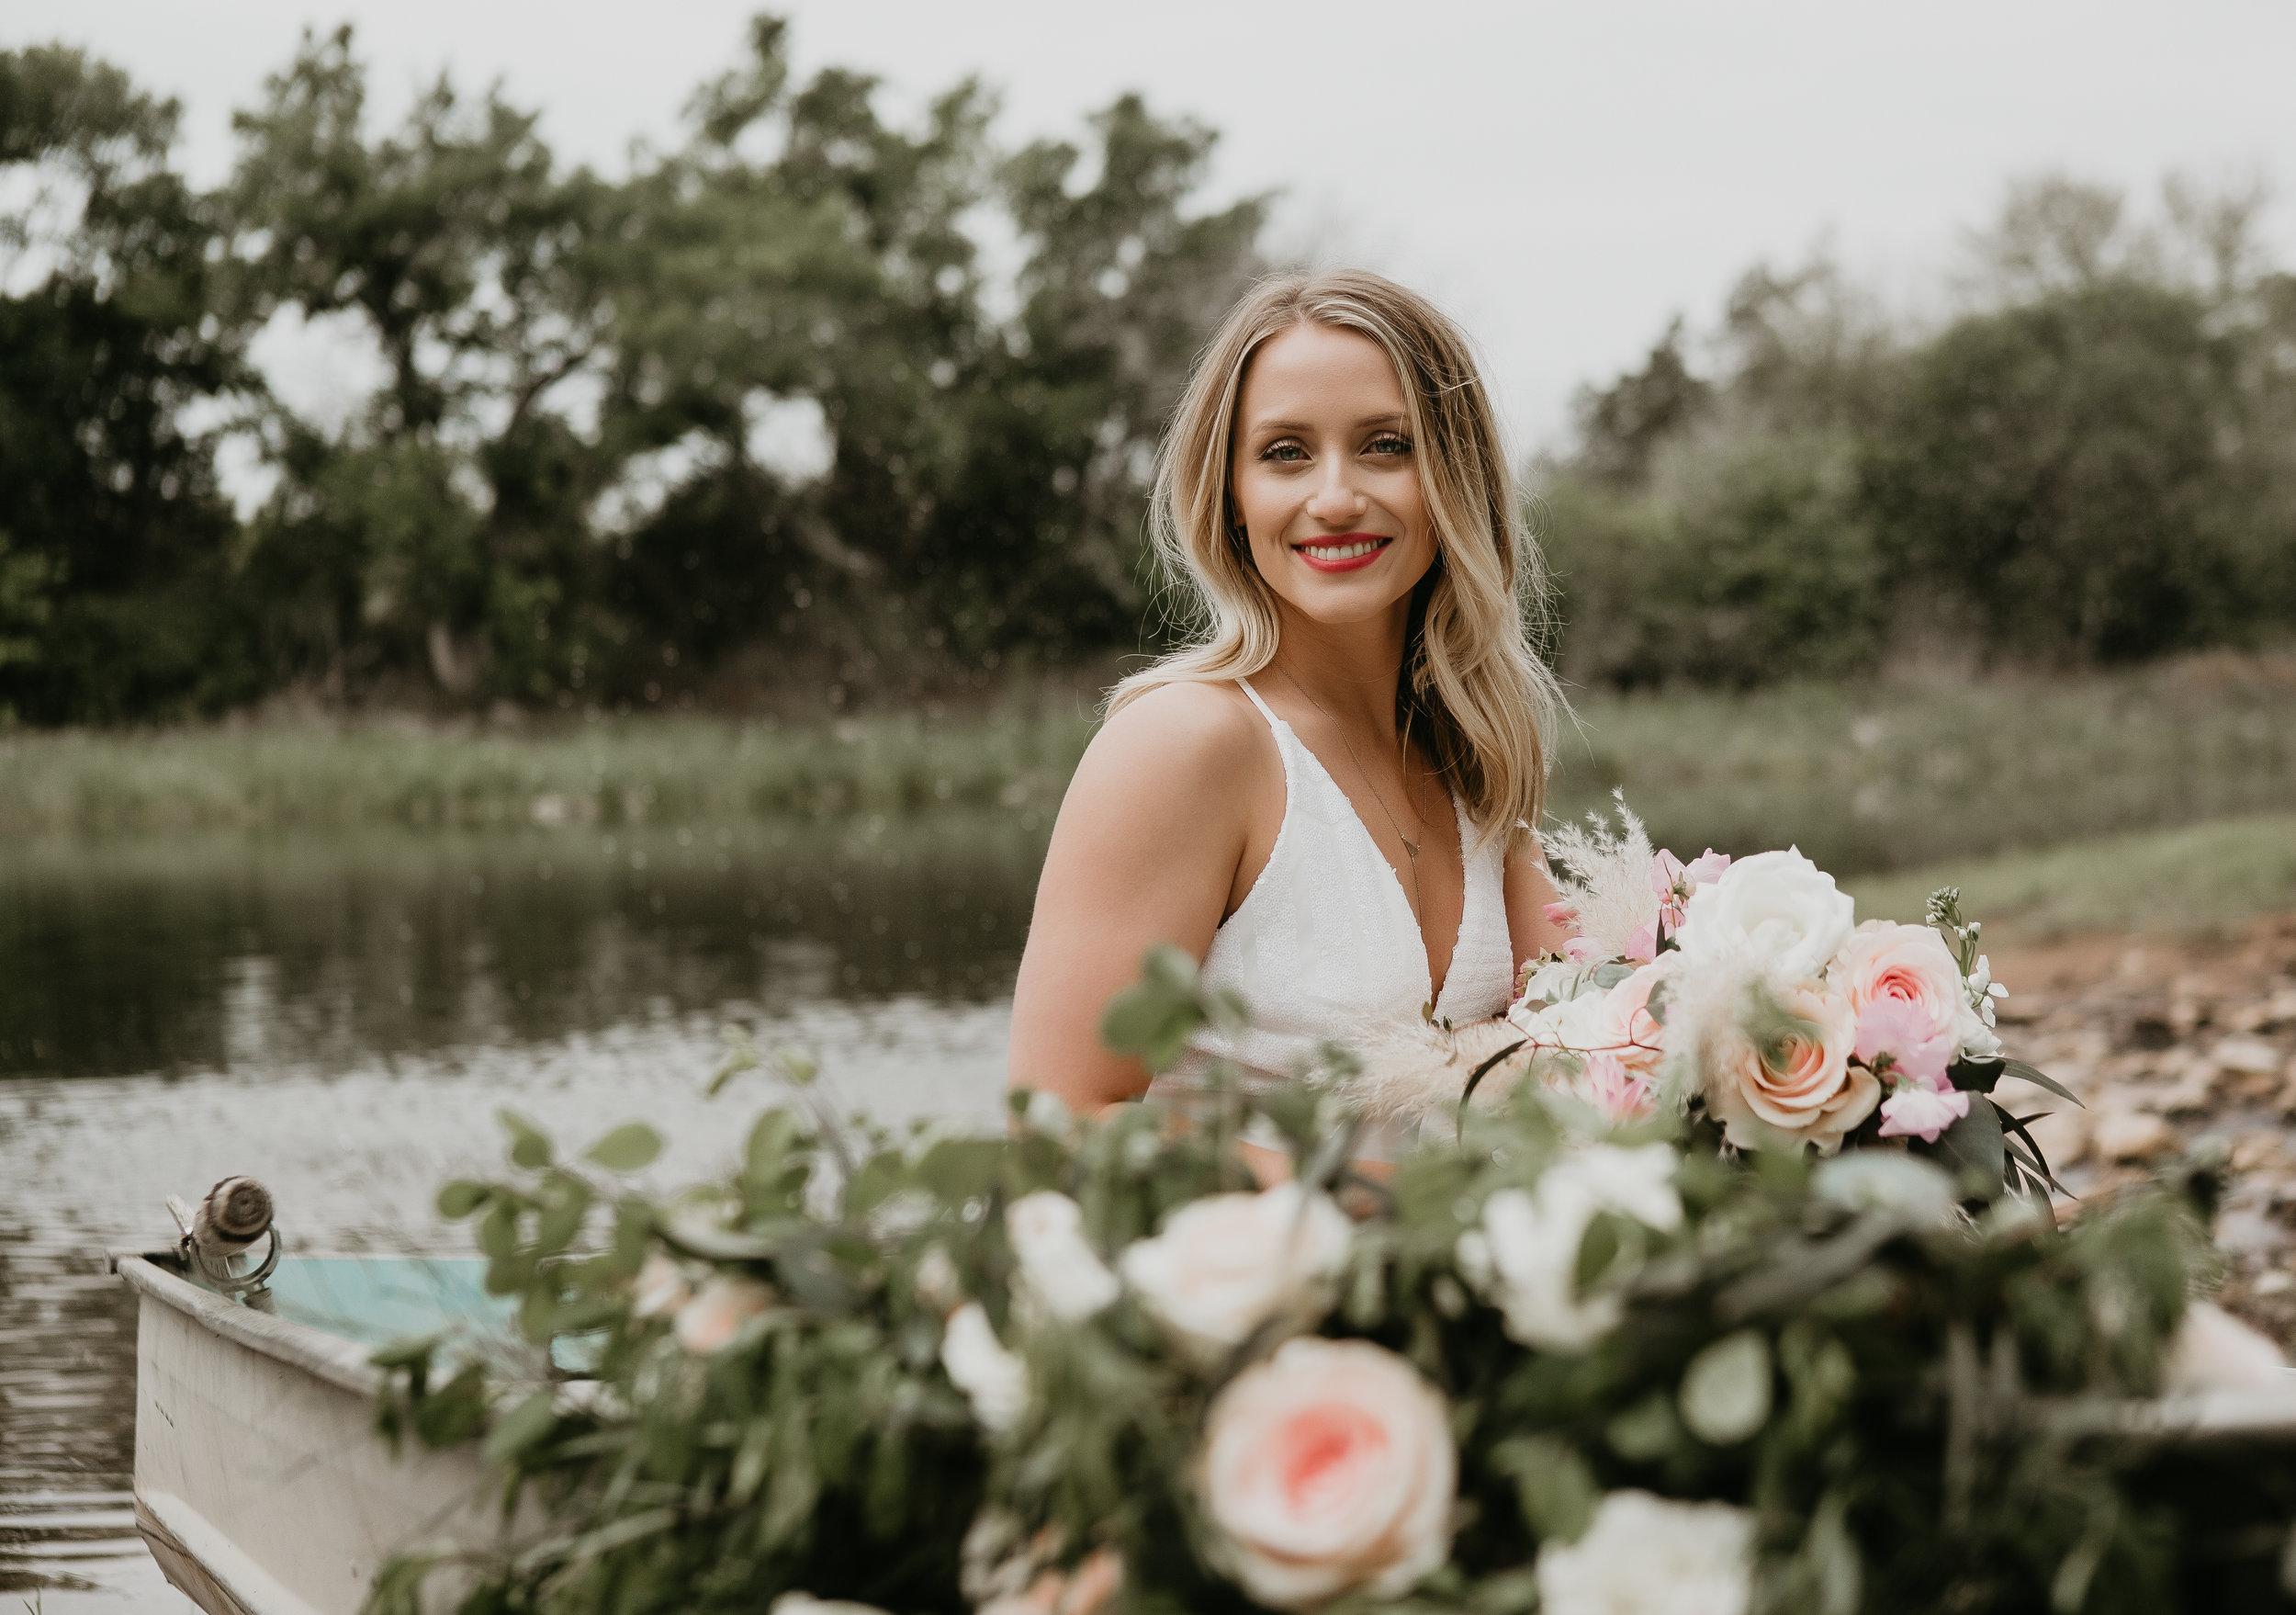 Lynsie.Rae.Photography_2018 Elopement_Austin TX-6.jpg